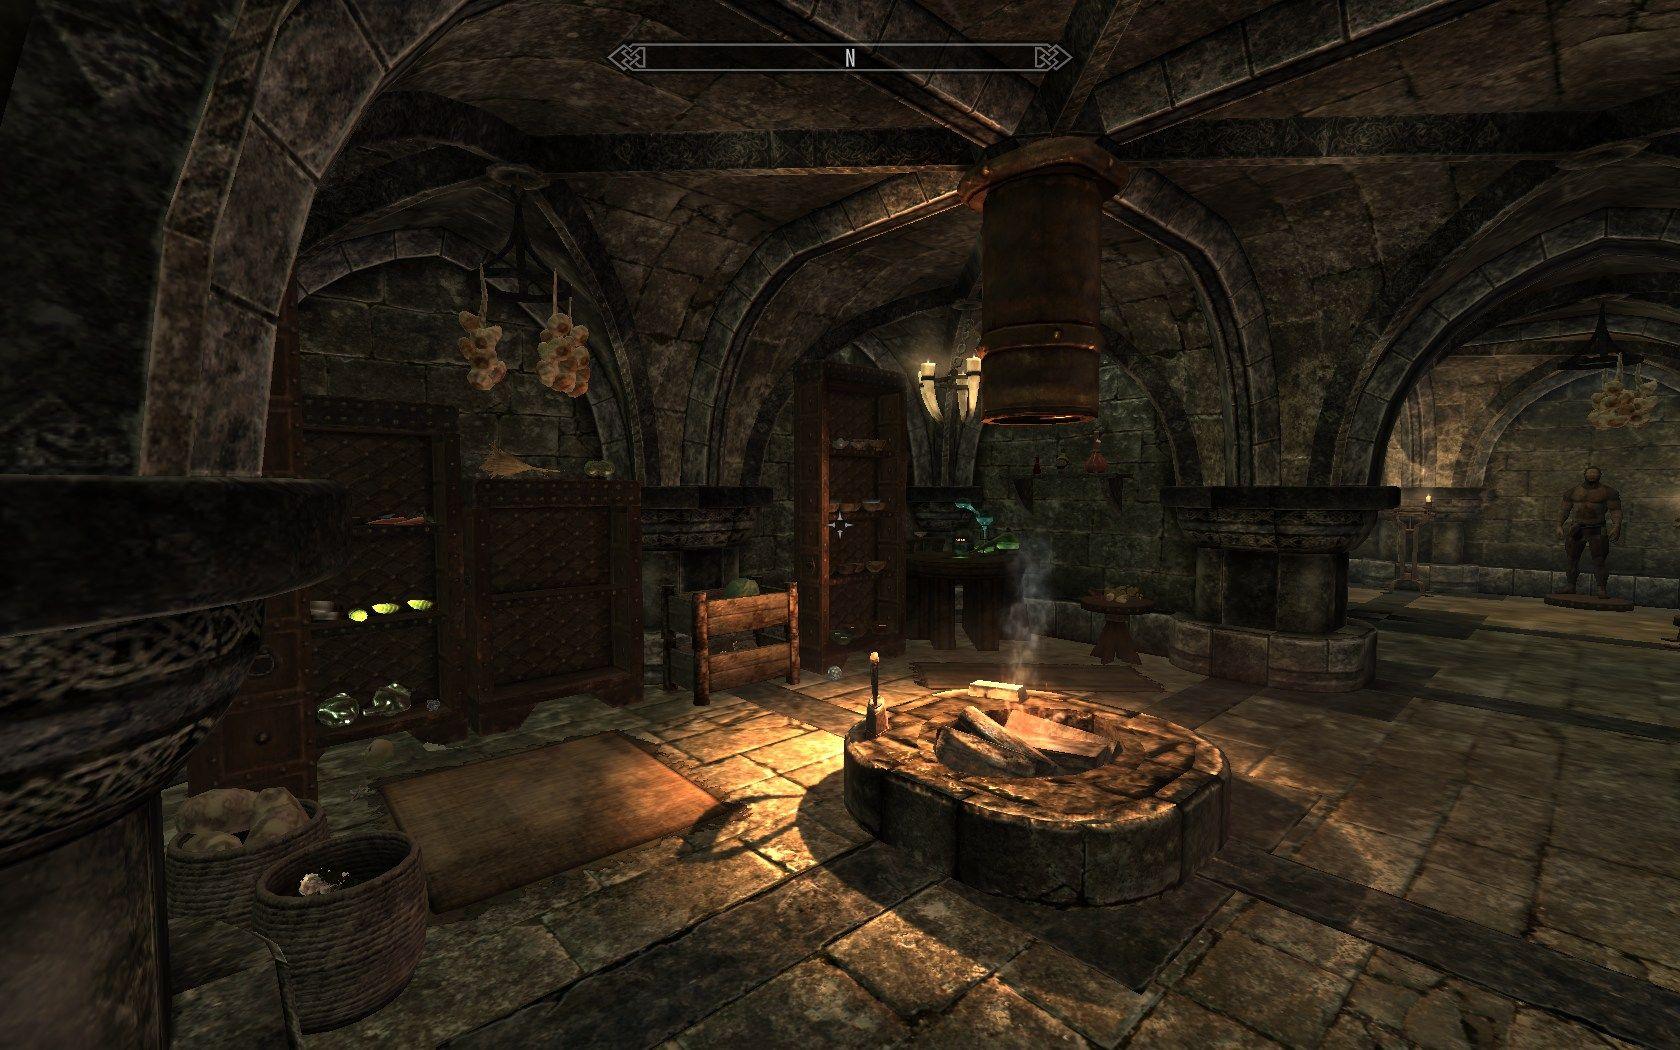 Elderscrolls Skyrim Interior Decor Ref In 2019 Fantasy